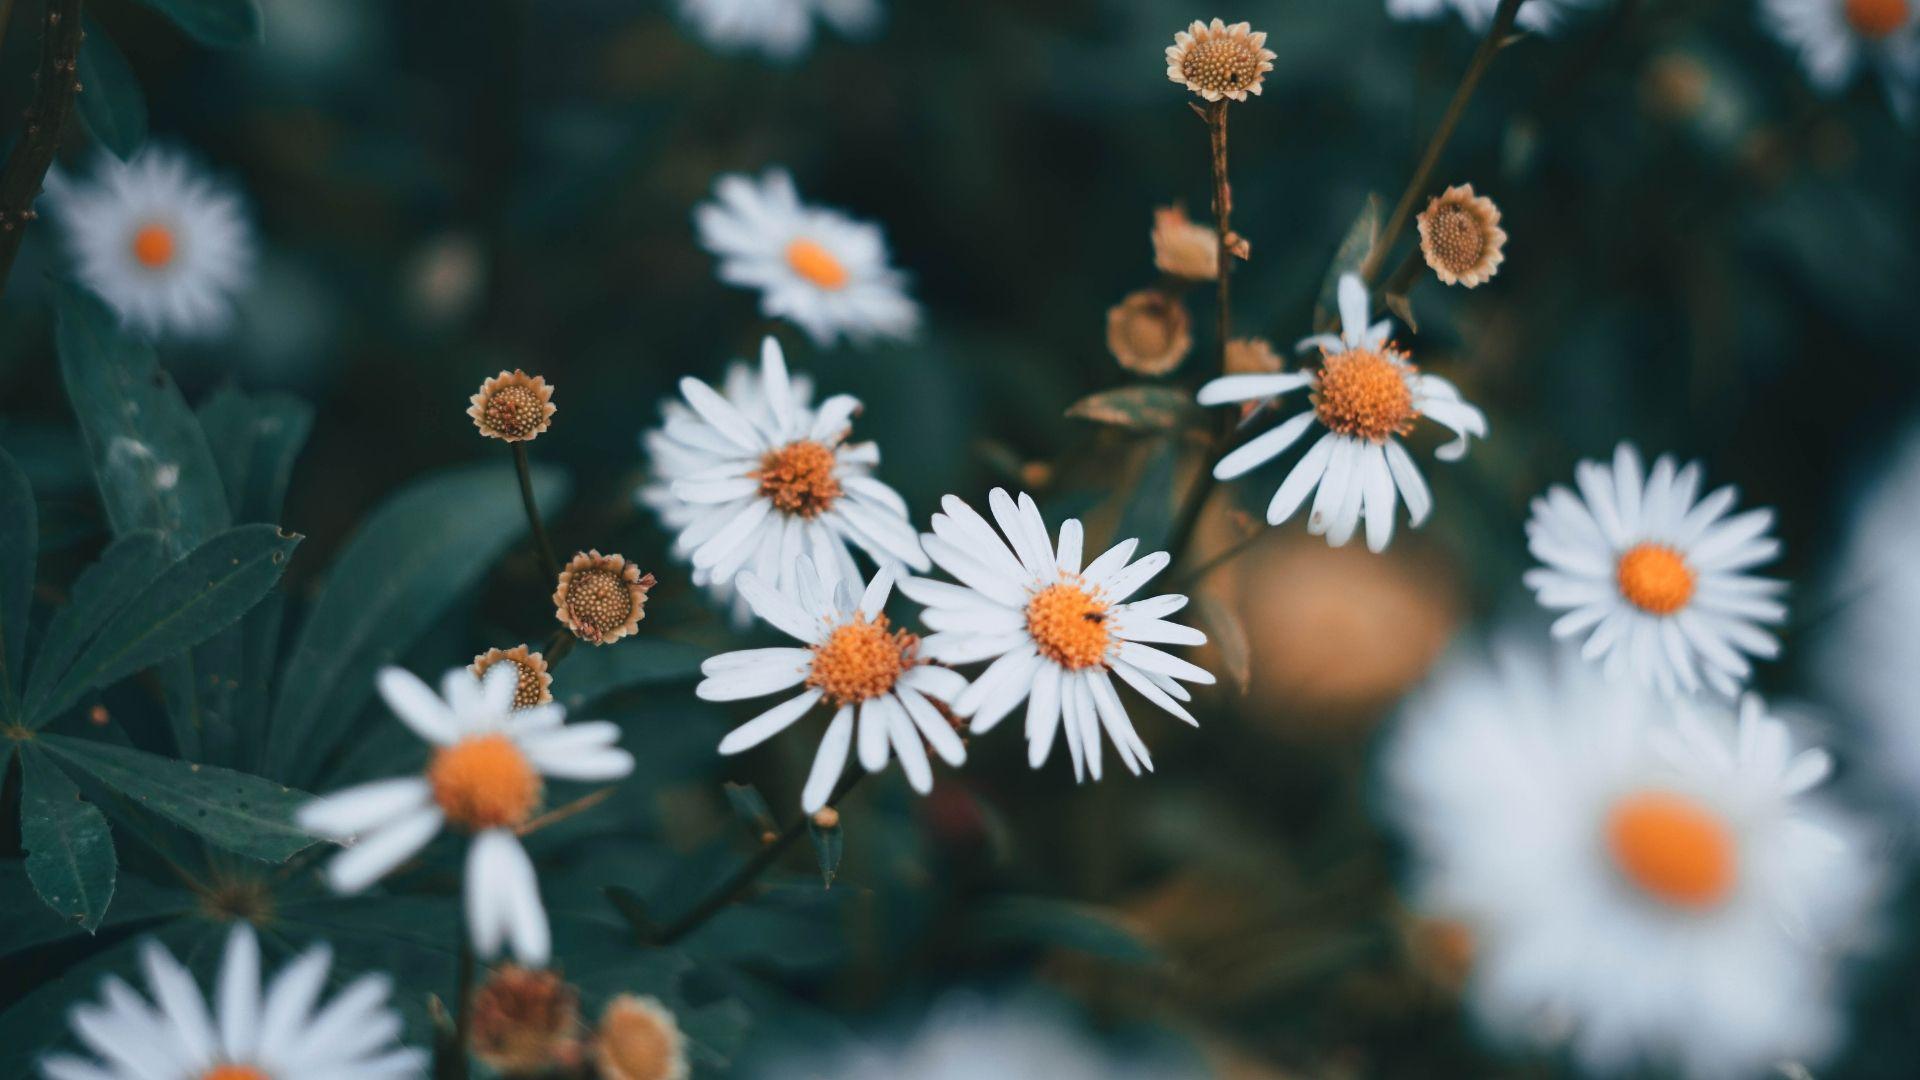 Little White Daisy Flowers